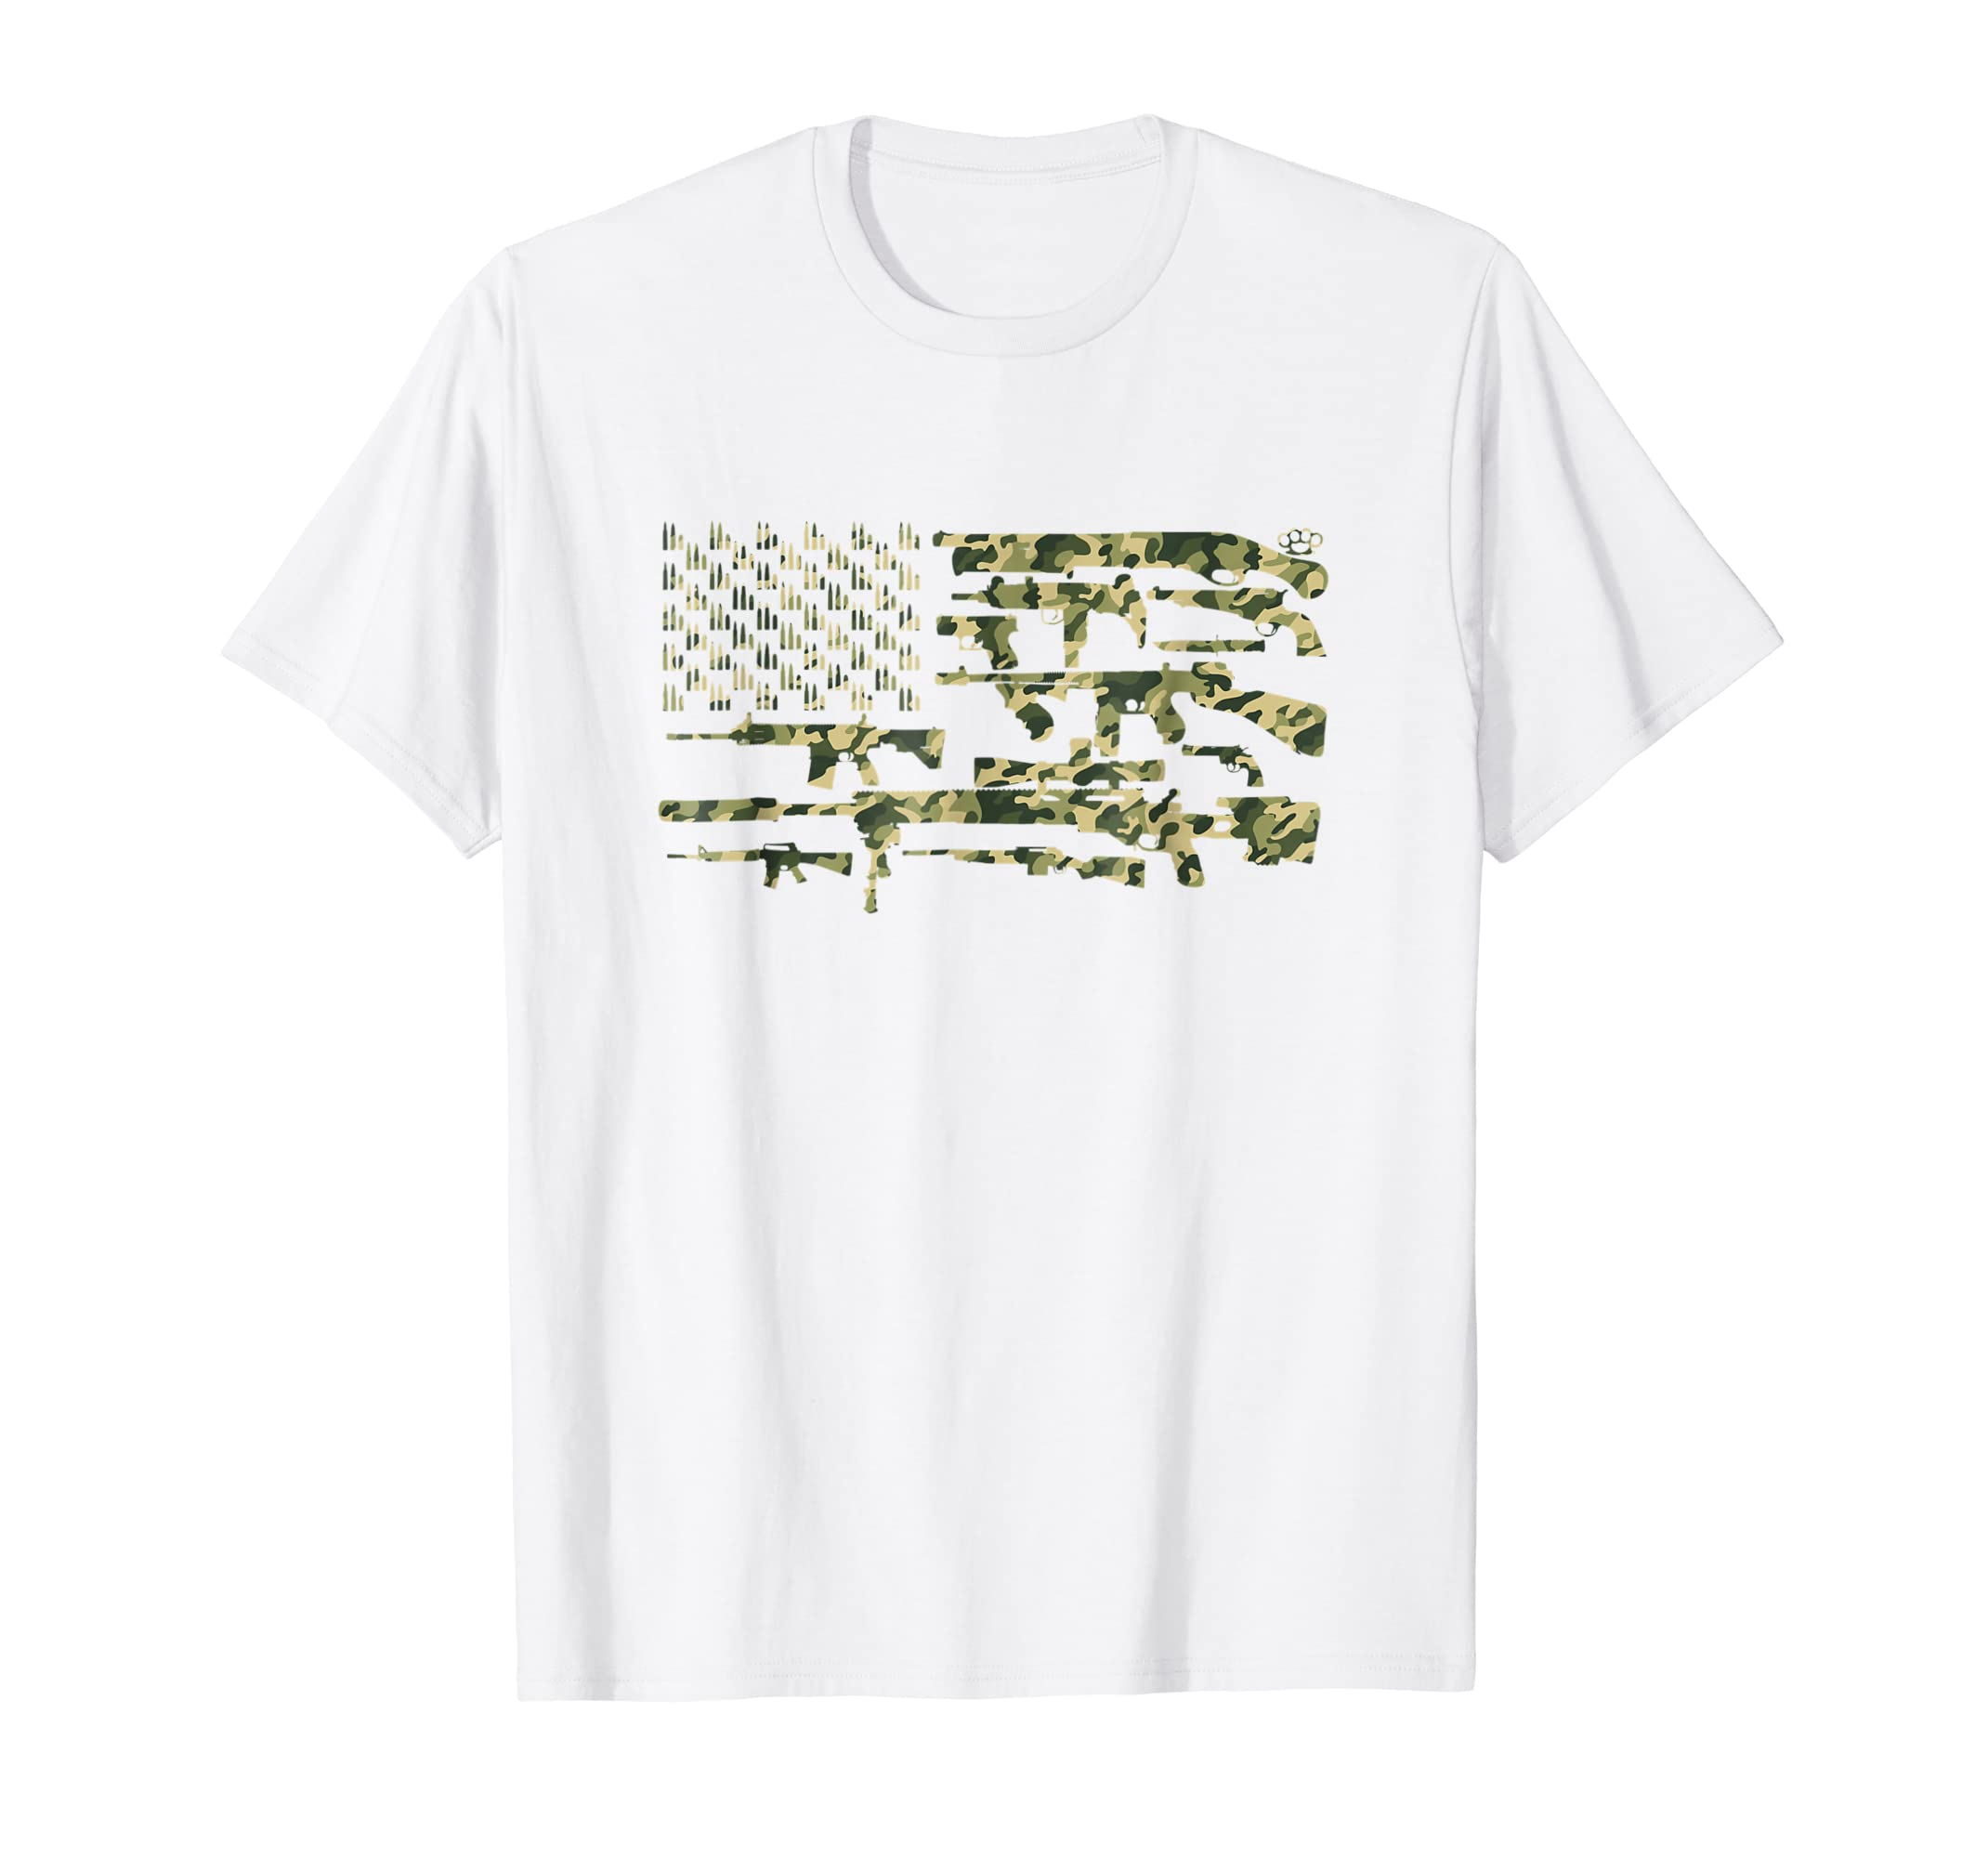 American 2nd Amendment USA Guns Flag Camo Short Sleeve Shirt-mt